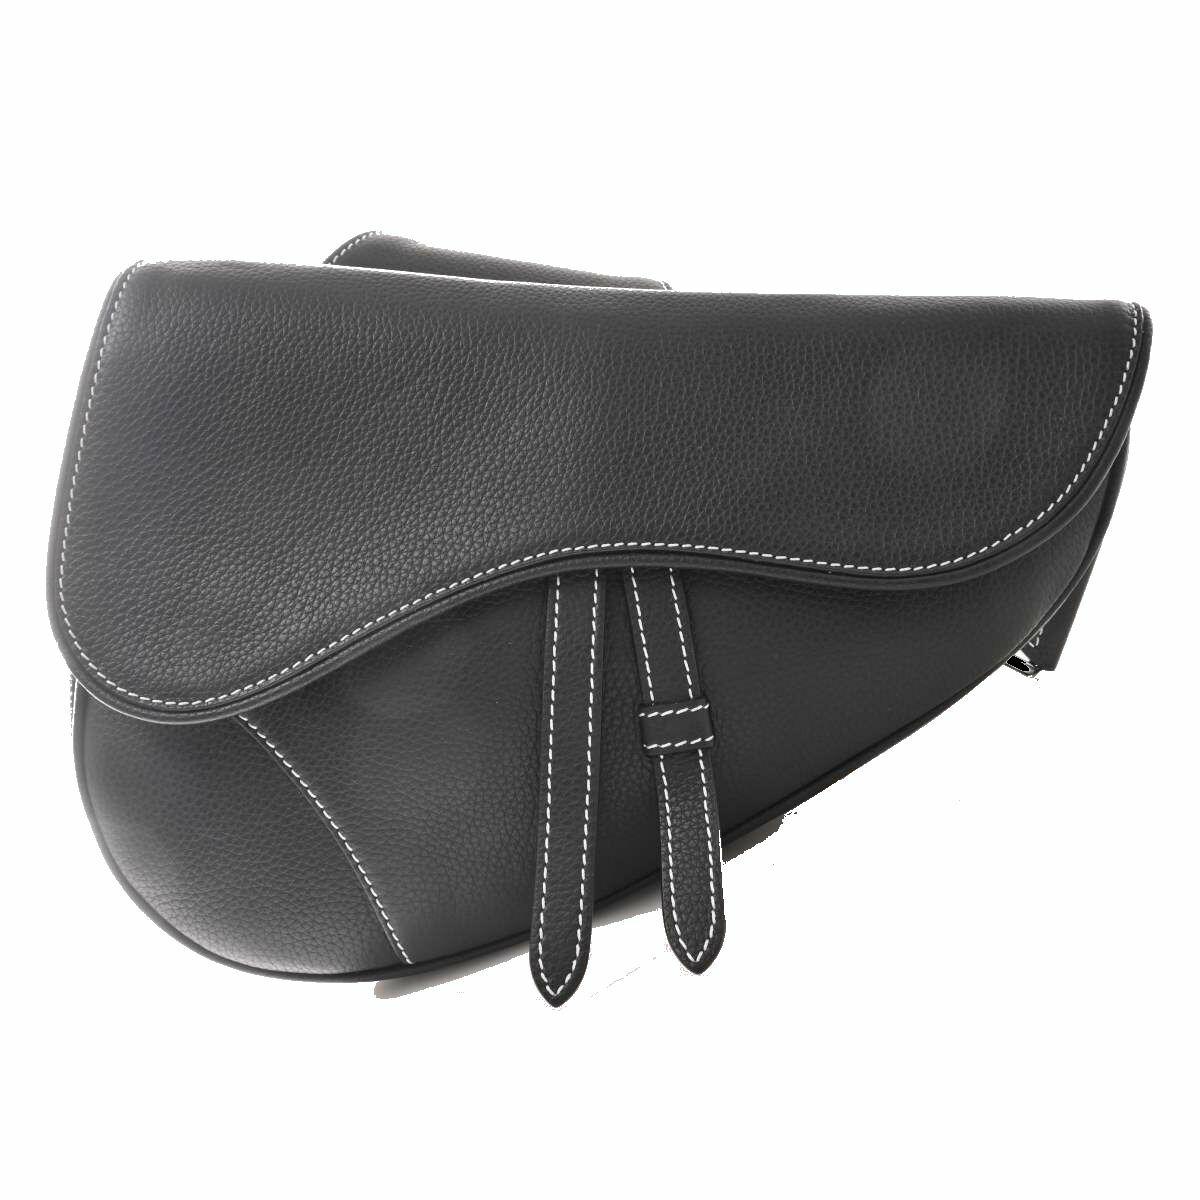 Christian Dior Leather Saddle Wes Bag Waist Black